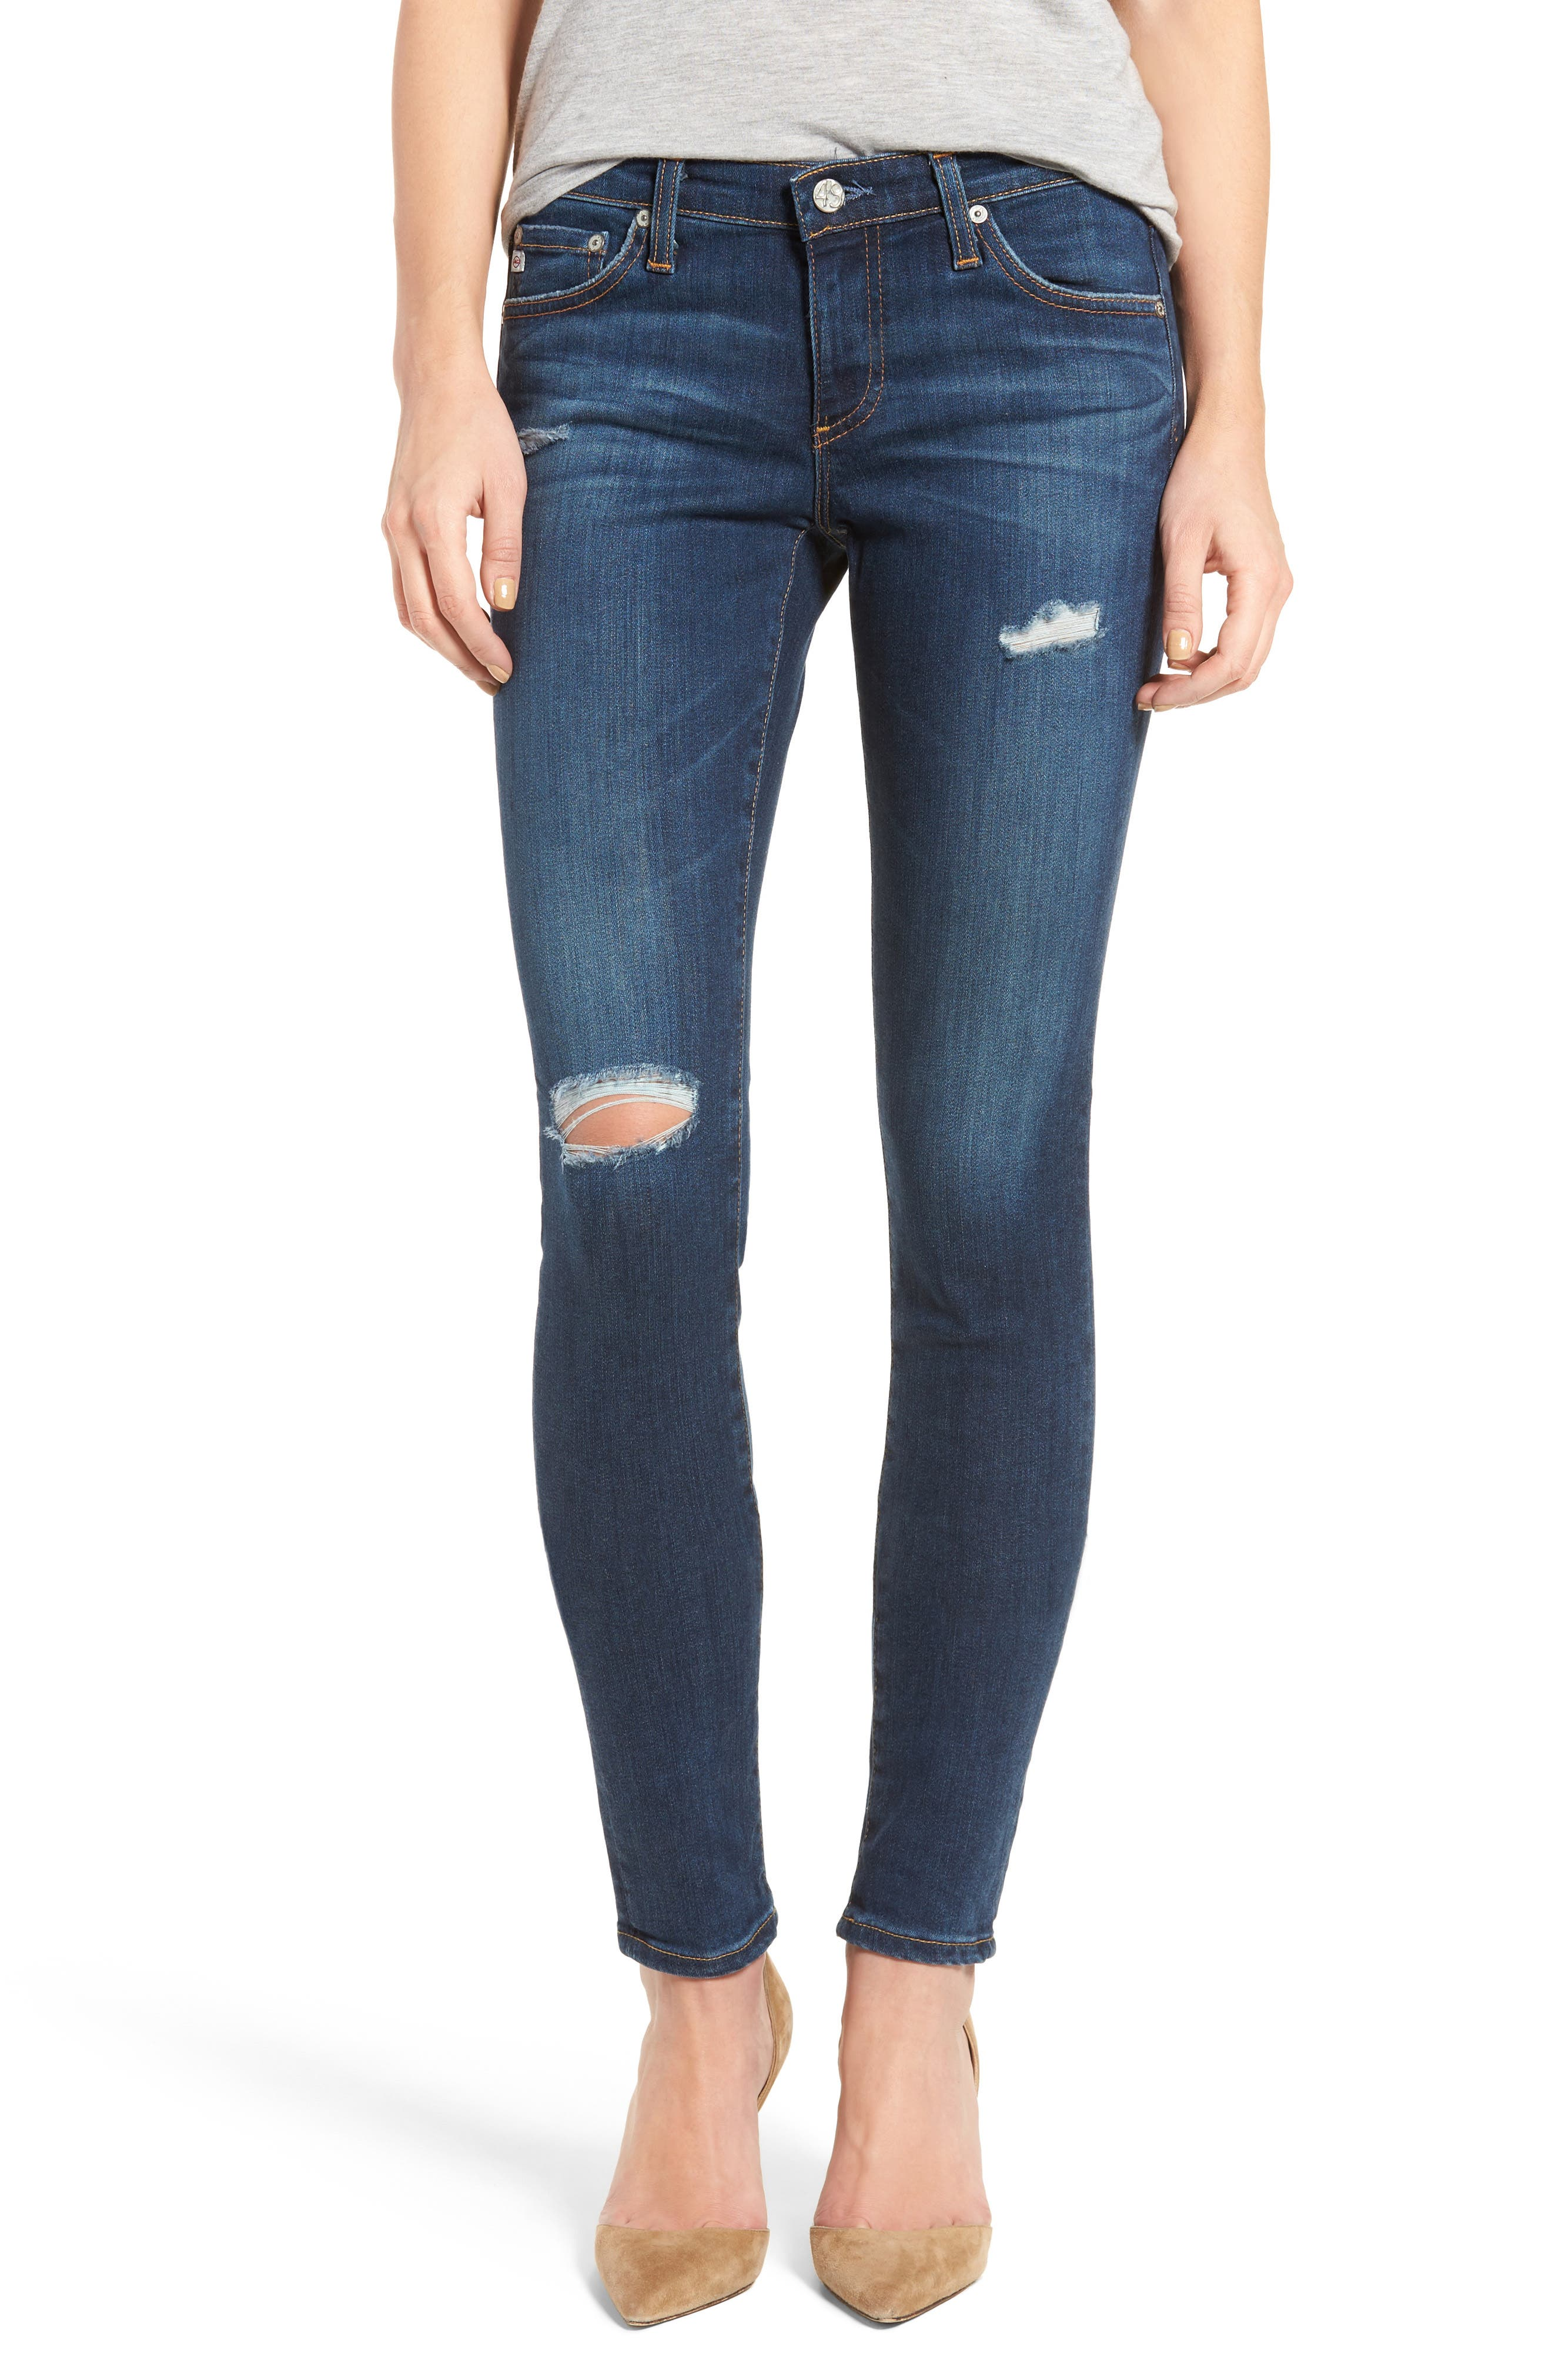 Alternate Image 1 Selected - AG The Legging Super Skinny Jeans (8 Years Wander)